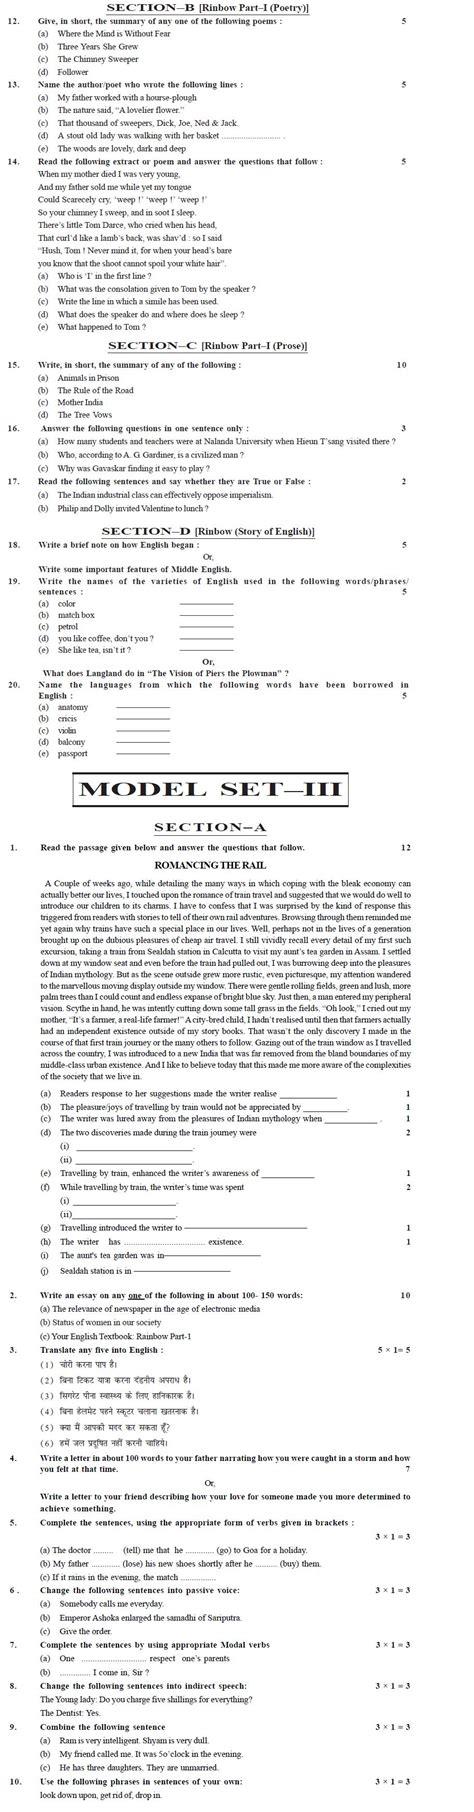 english question pattern of class 11 bihar board 11th model paper english bseb model paper